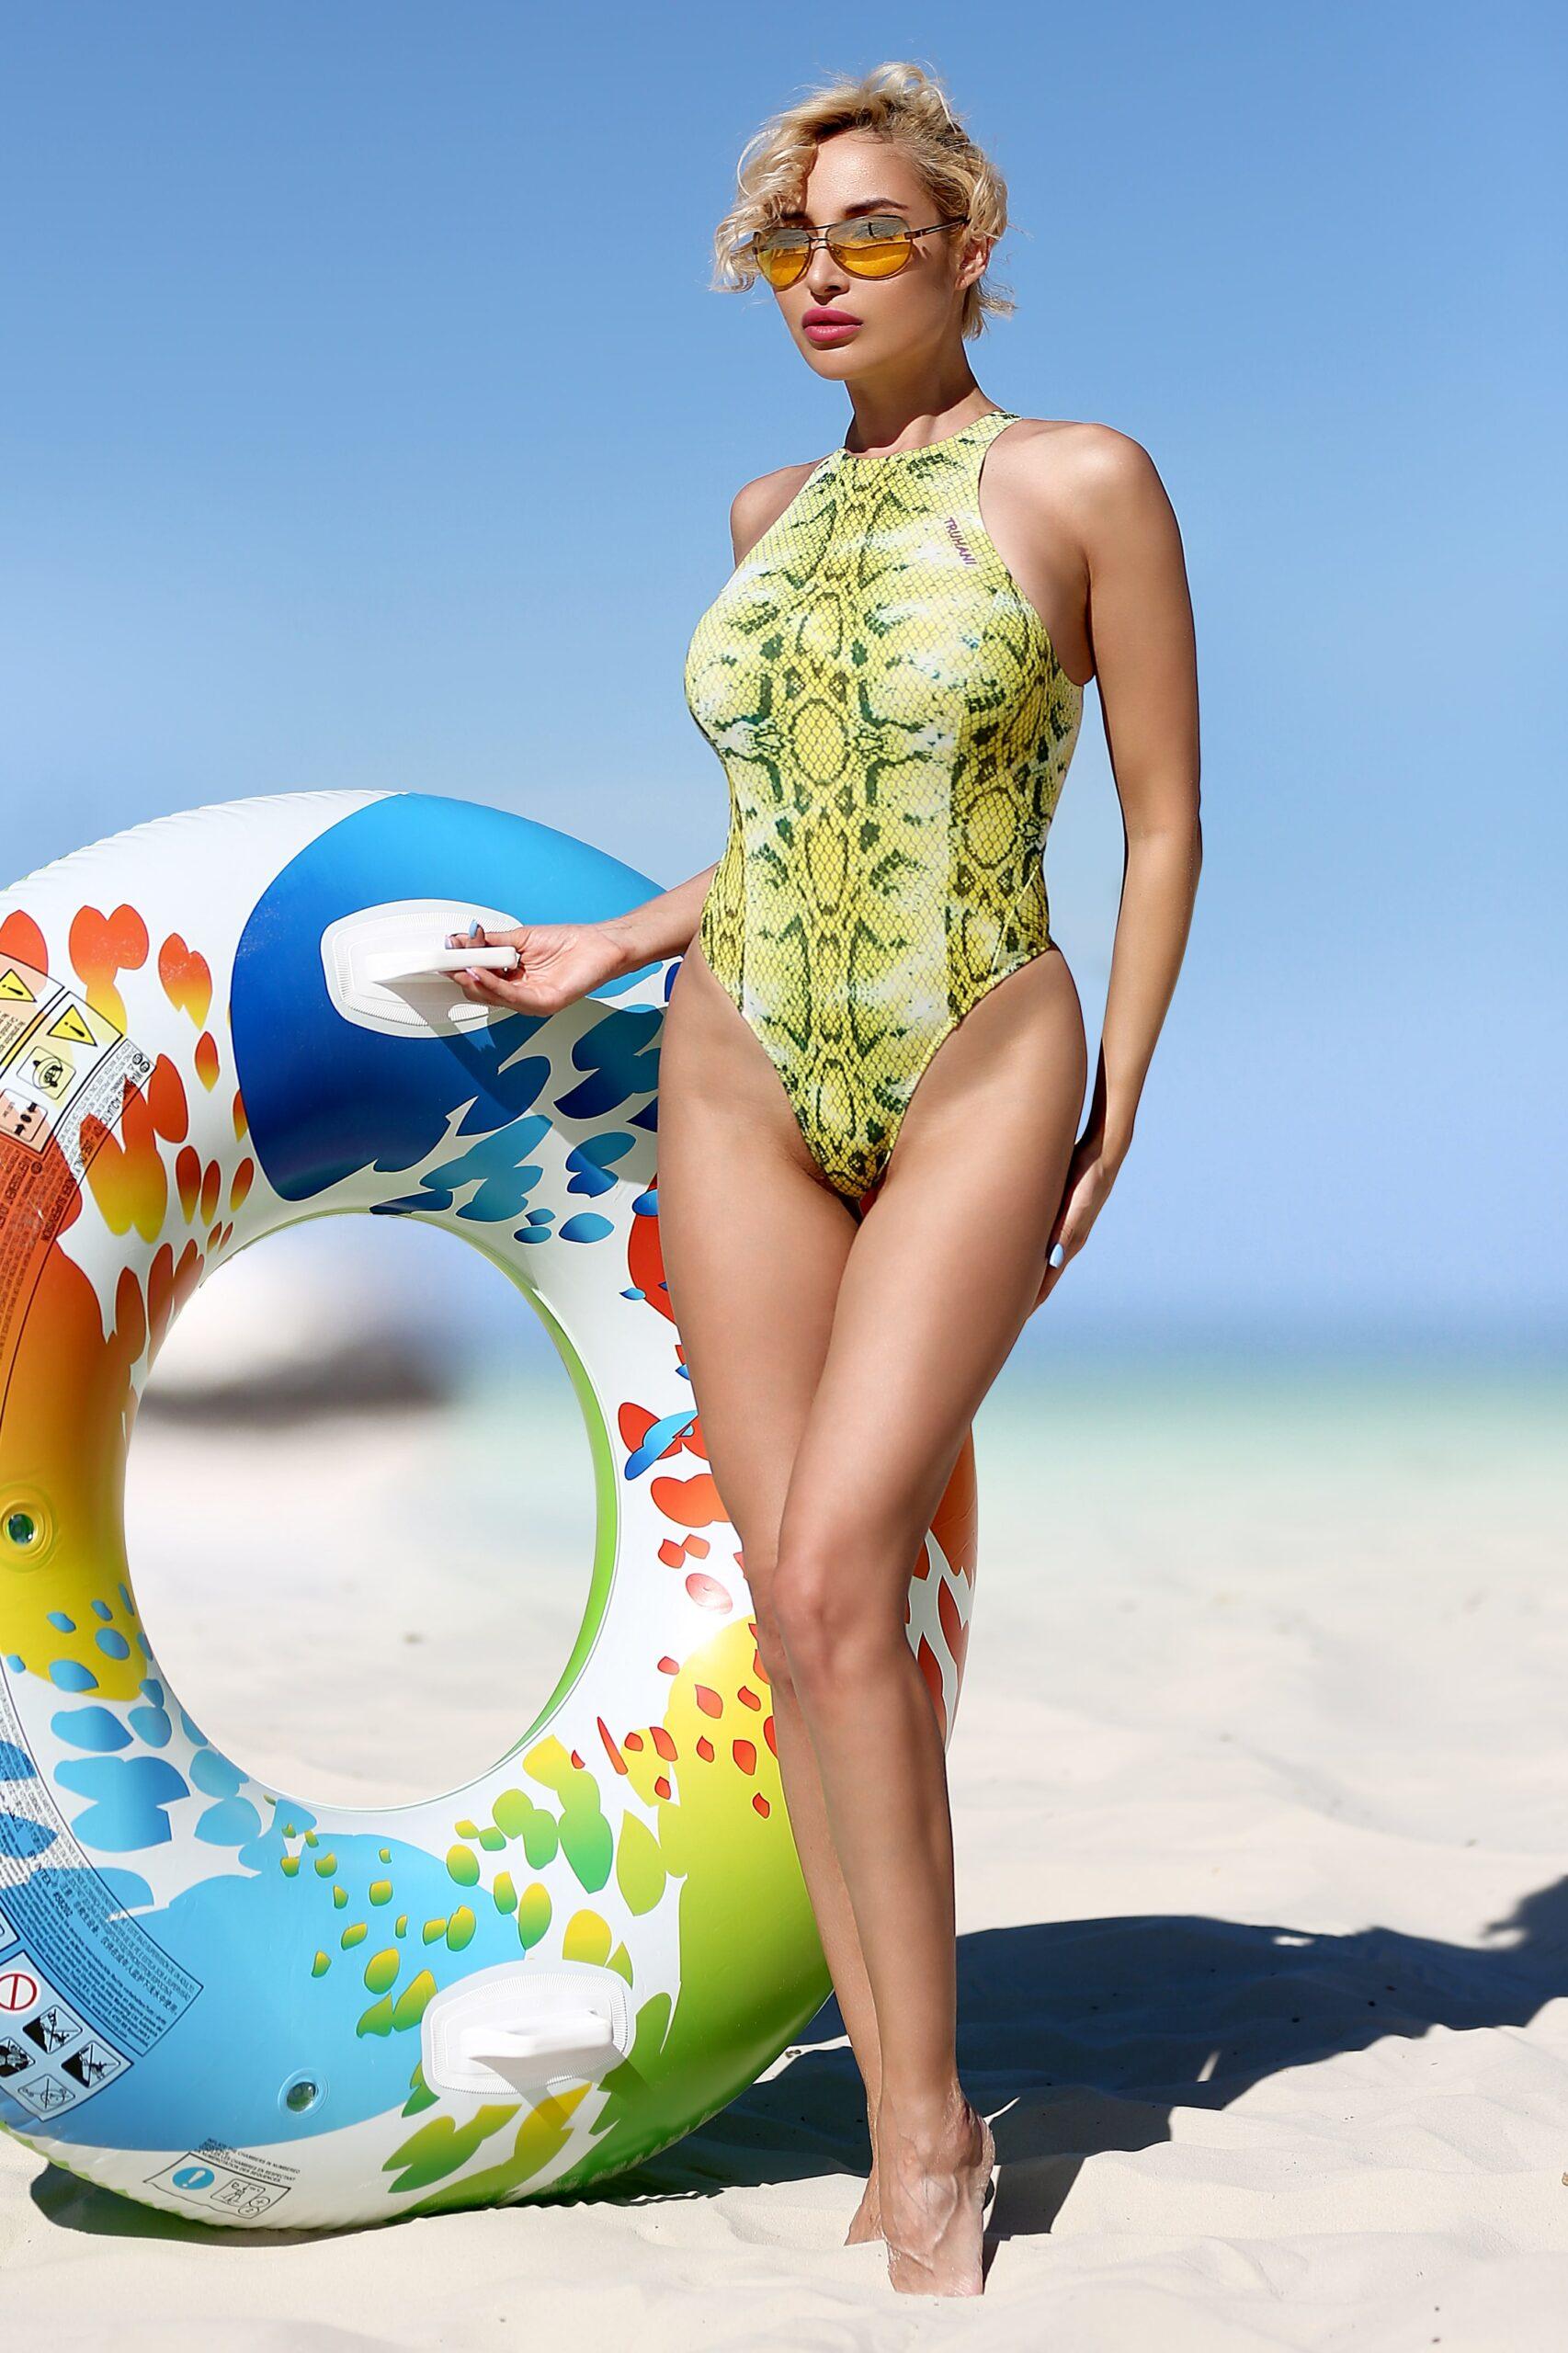 Sexy white bathing suit Thong swimsuit Cute high neck hot cheeky monokini Sport high cut leg bodysuit One piece women designer swimwear 2020